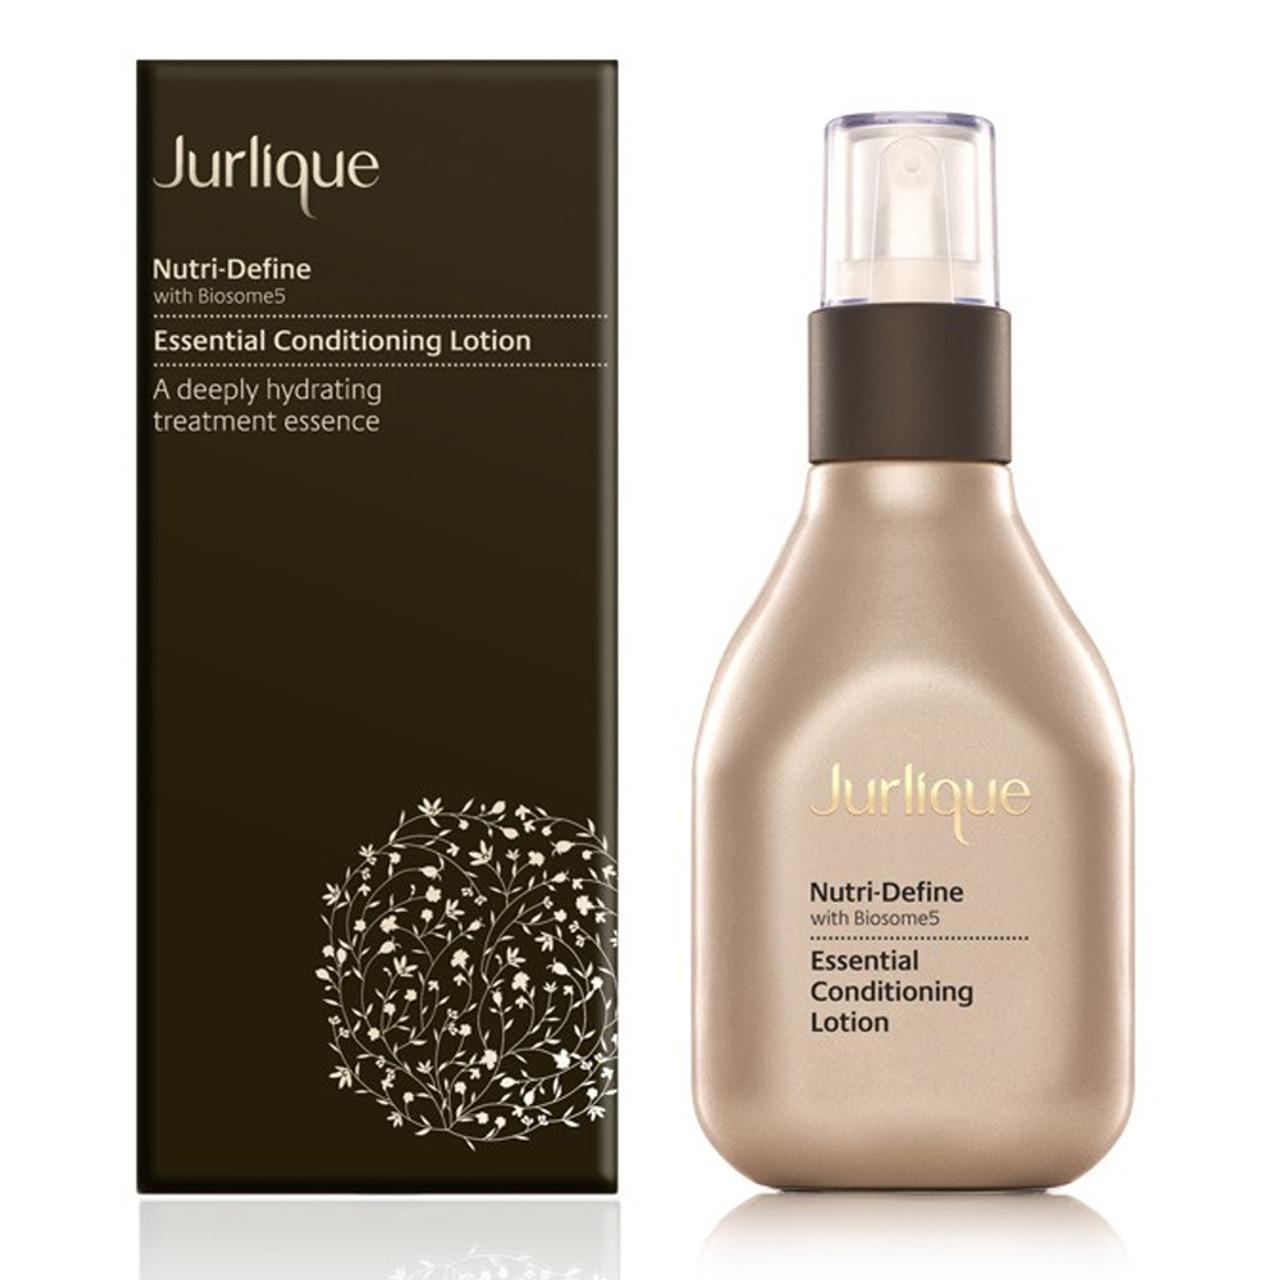 Jurlique Nutri Define Essential Conditioning Lotion (discontinued)